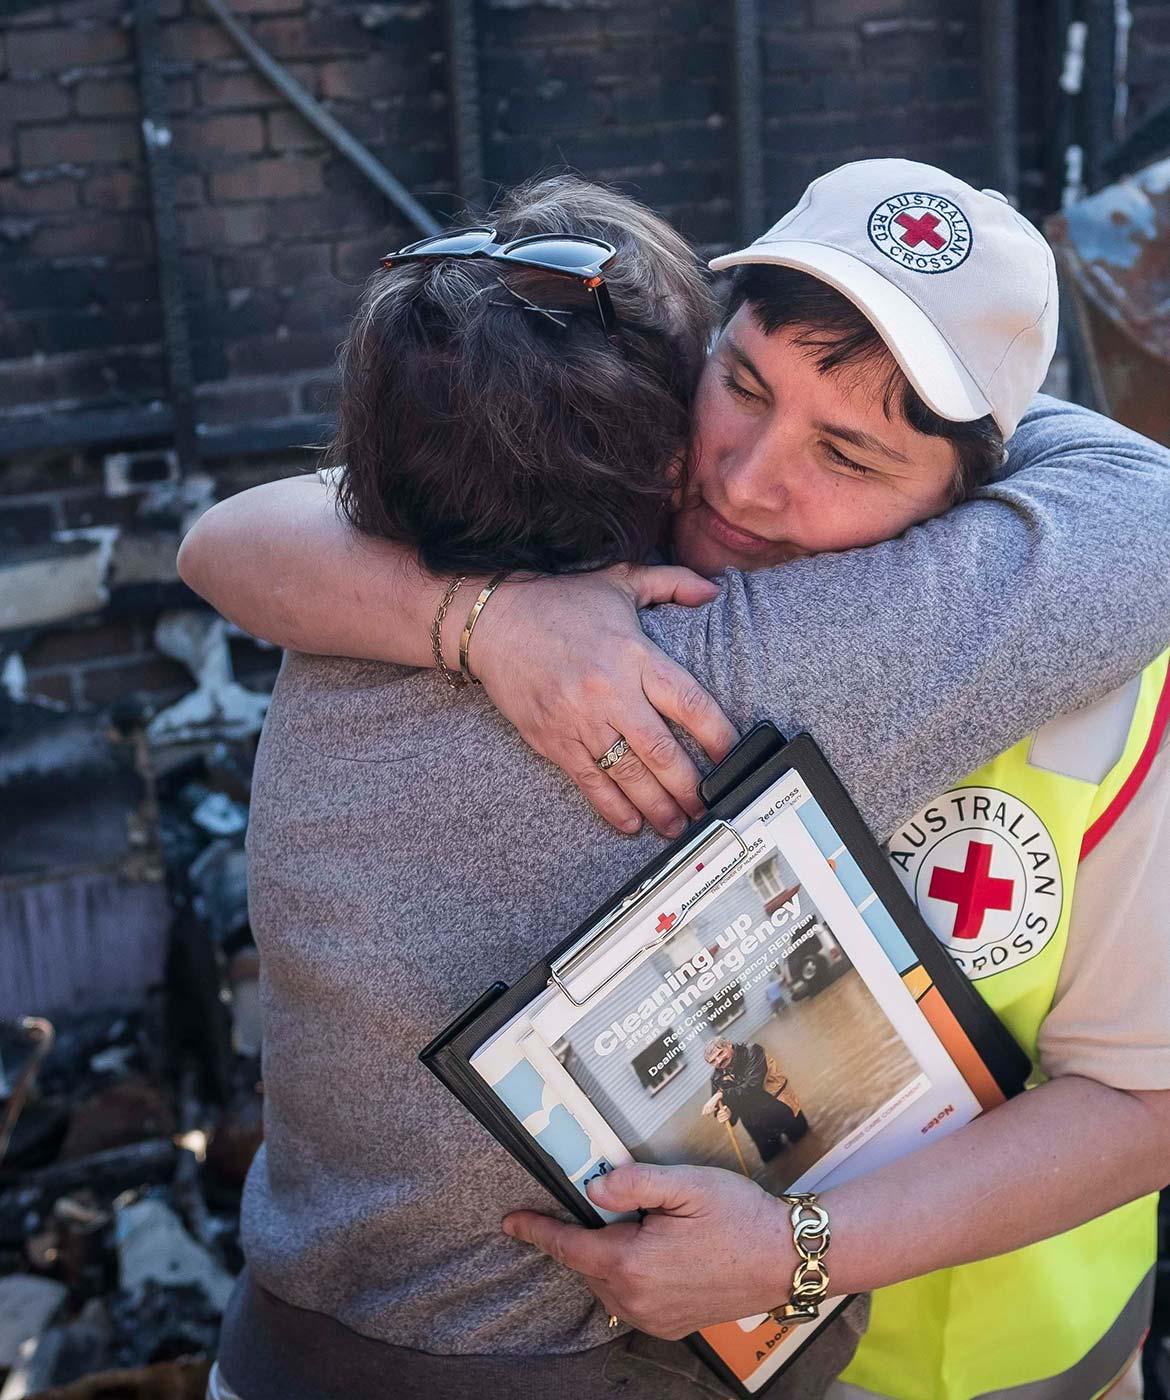 Red cross worker hugging woman